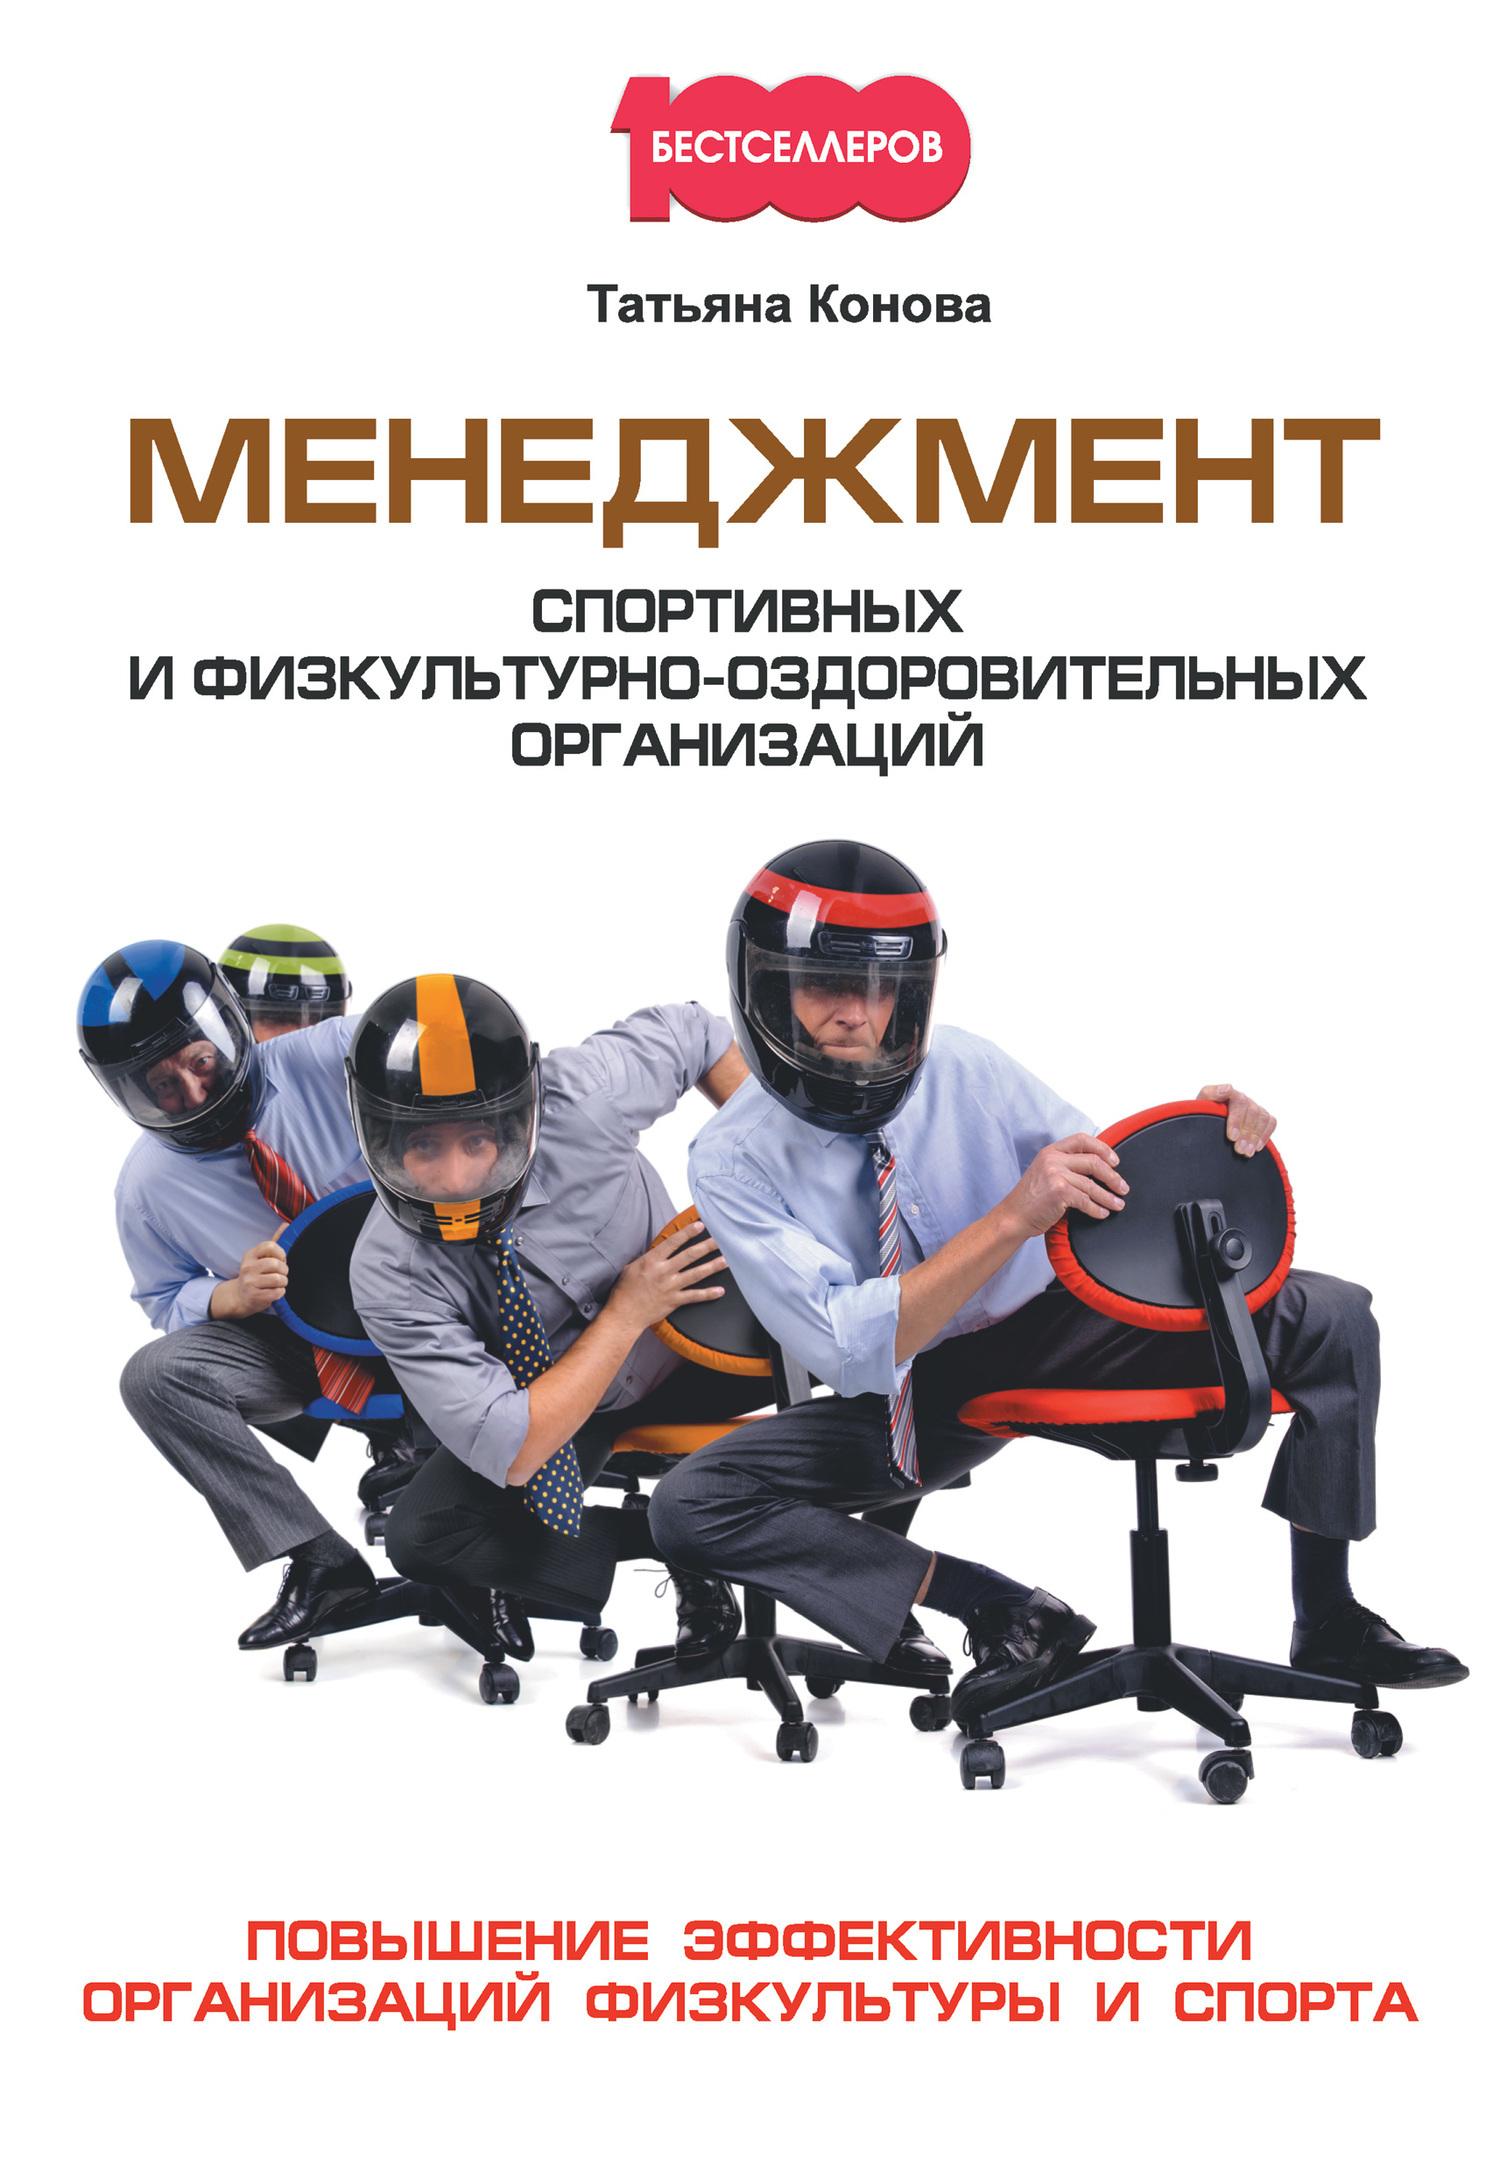 Обложка книги. Автор - Татьяна Конова